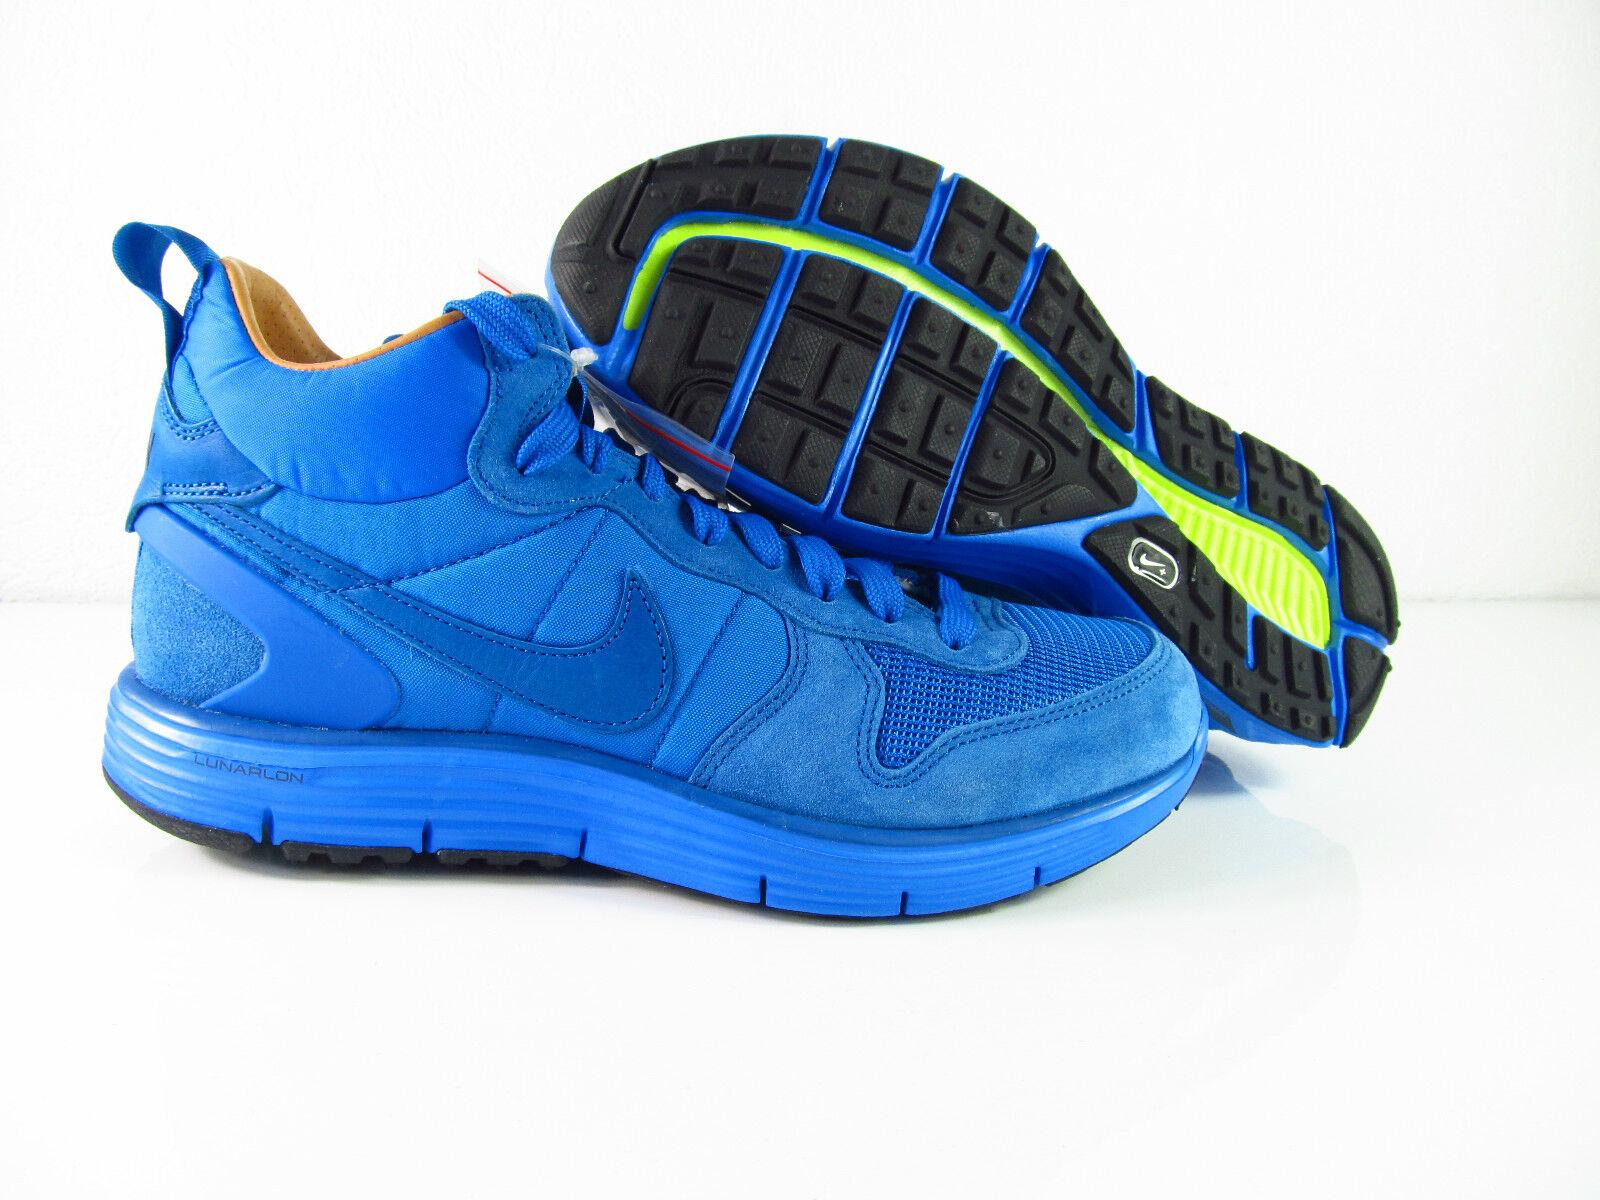 Nike Lunar Solstice MID SP Court Blue Del Sol Marina NSW White Label Pack Eur_40